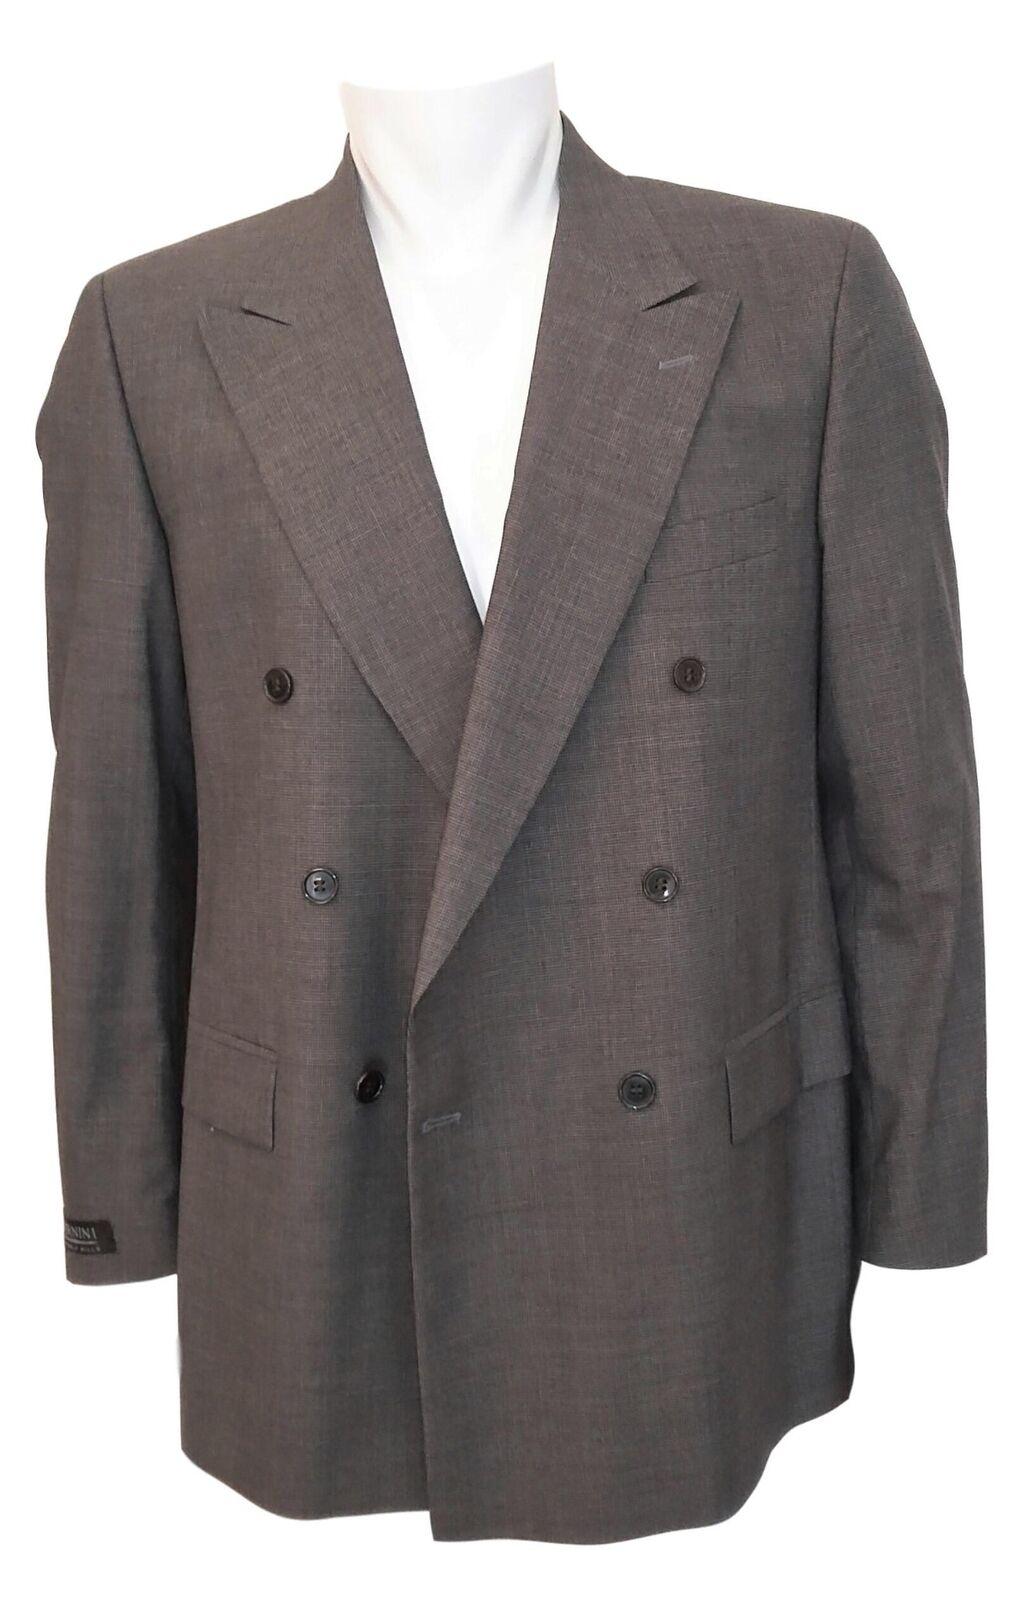 NEW Bernini Beverly Hills Double Breasted Wool Suit  Herren Sz 50R/34 - Braun B1380